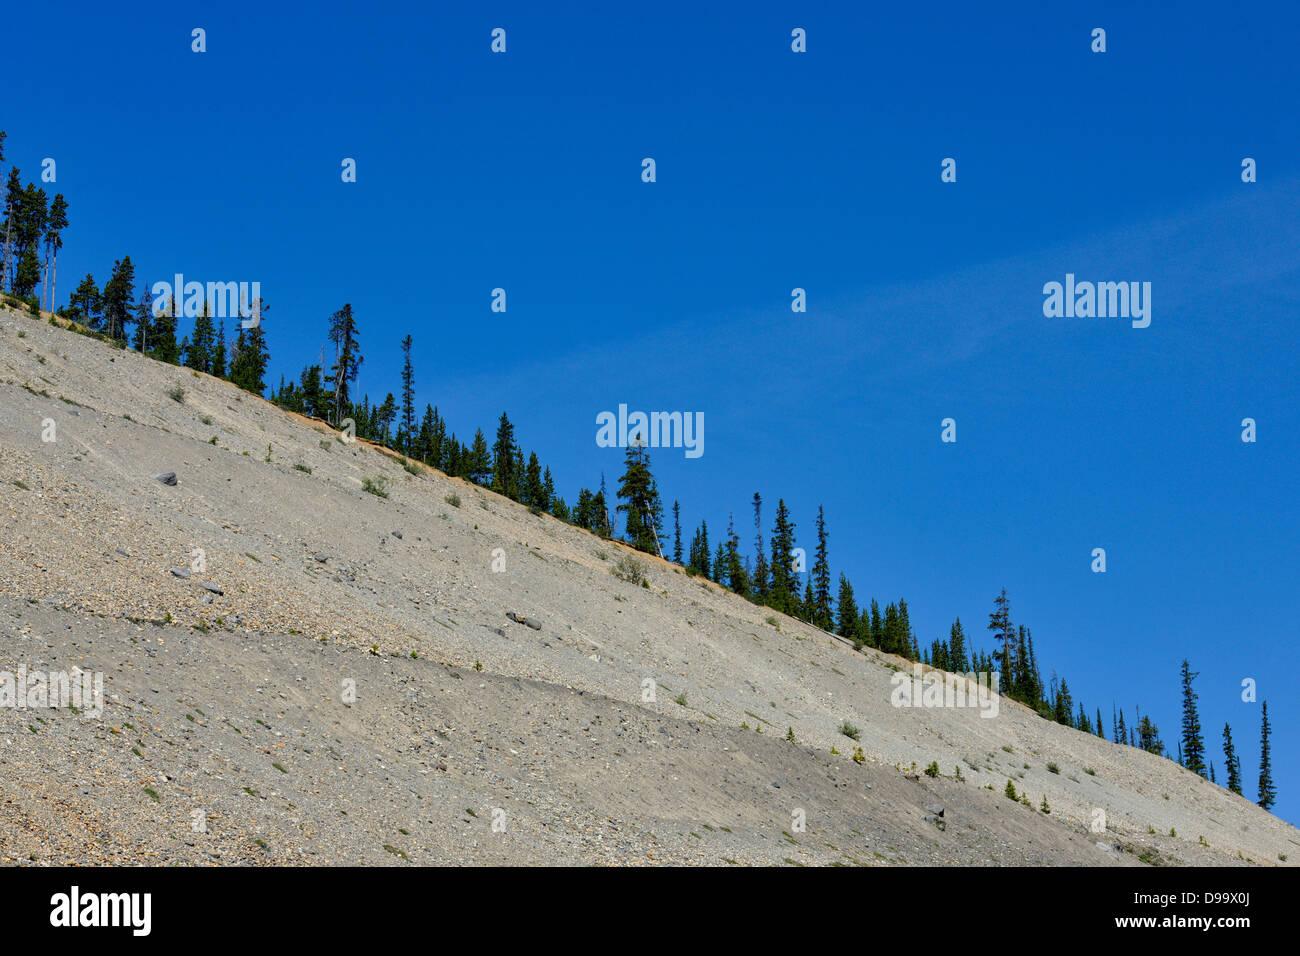 Subalpine firs on a scree slope ridge Banff National Park Alberta Canada - Stock Image